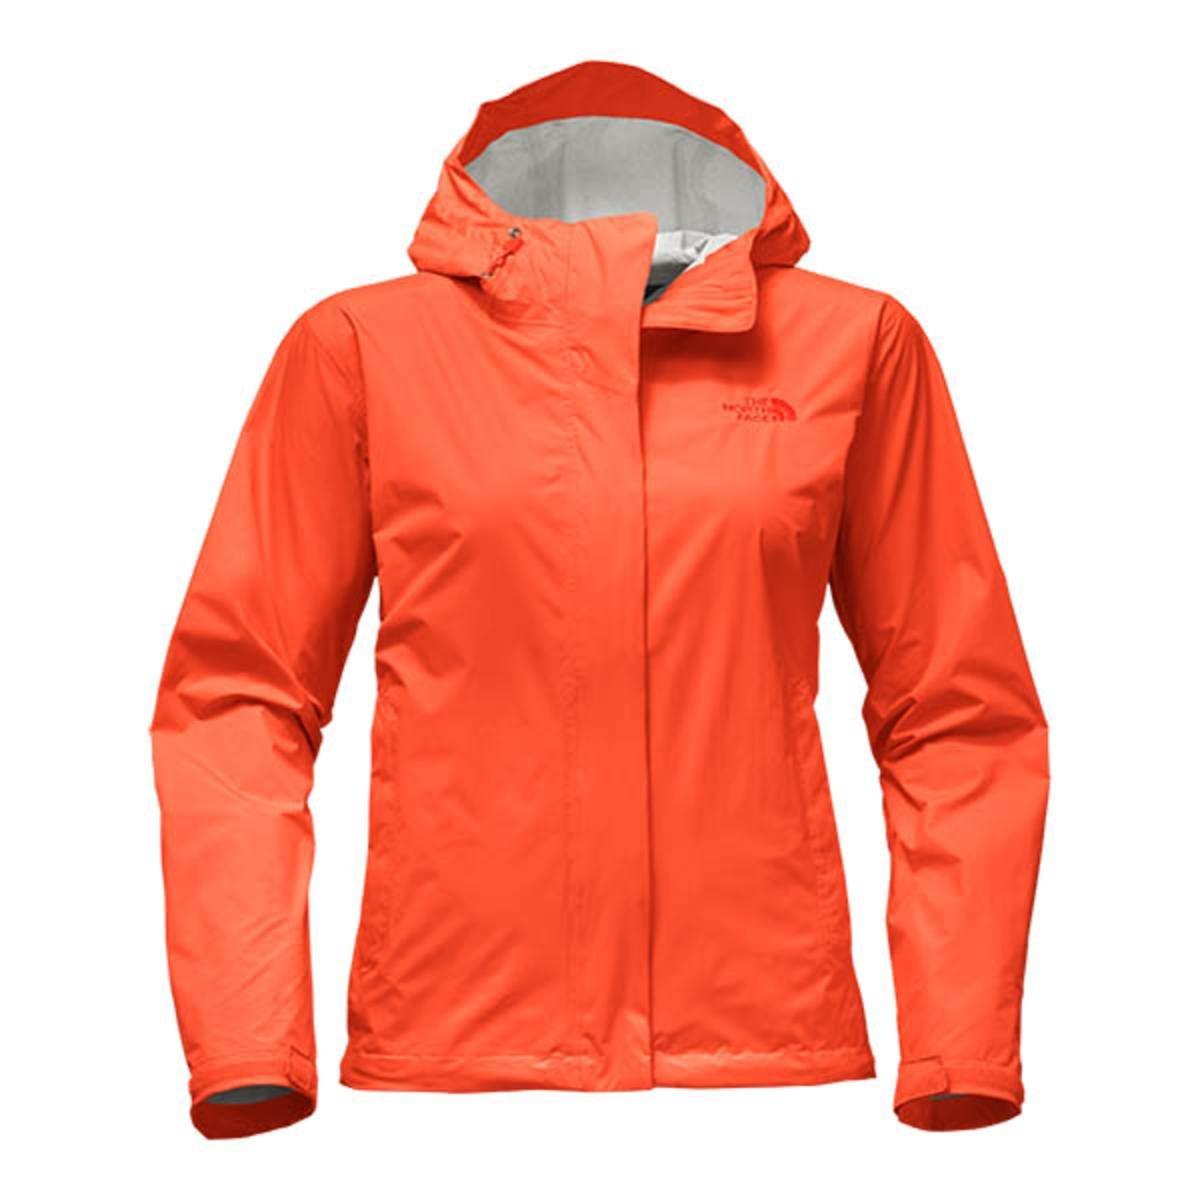 The North Face Women's Venture 2 Jacket - Nasturtium Orange - XS (Past Season)